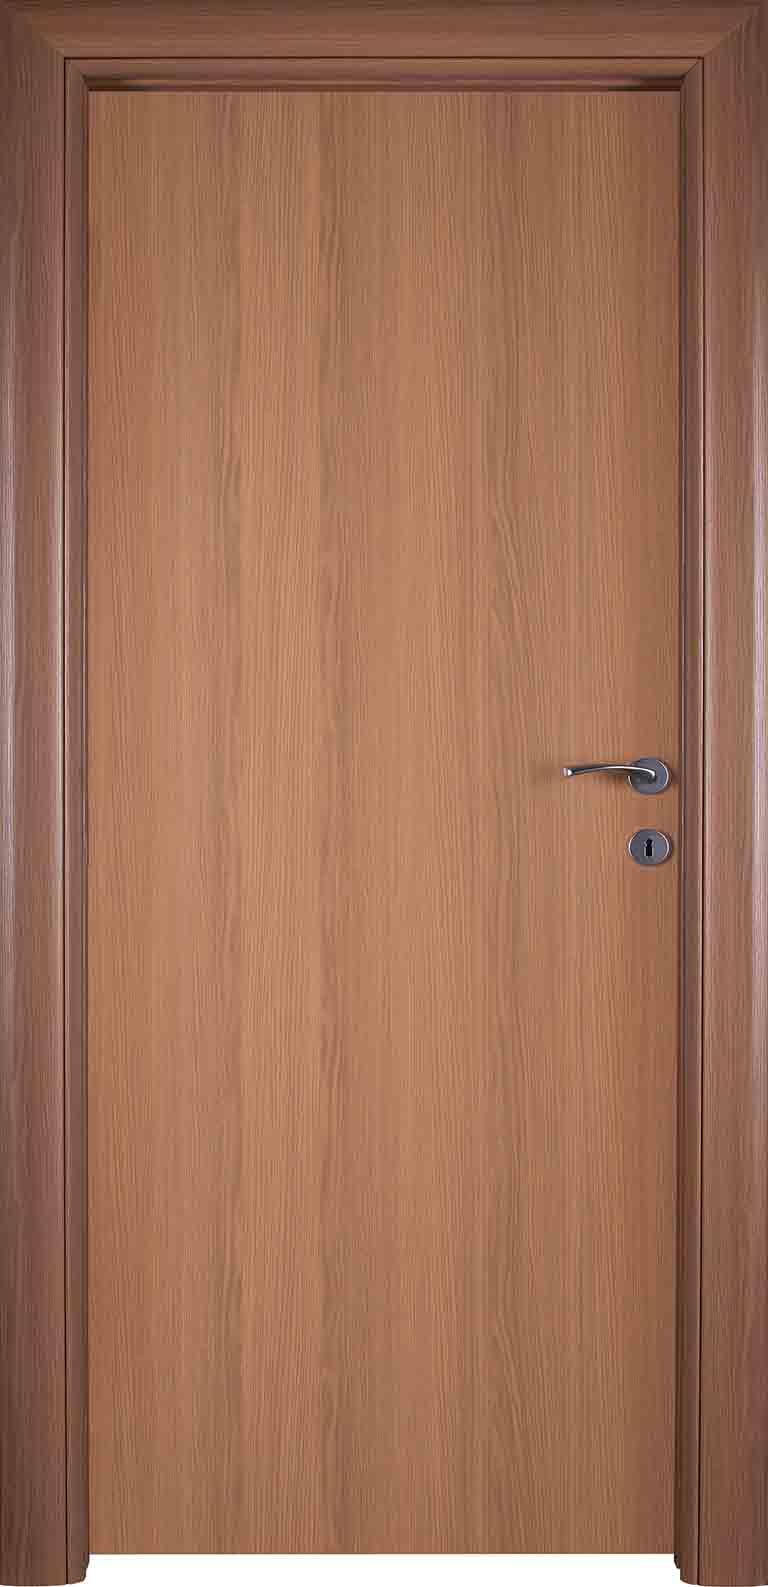 protuprovalna vrata forlux svjetli hrast